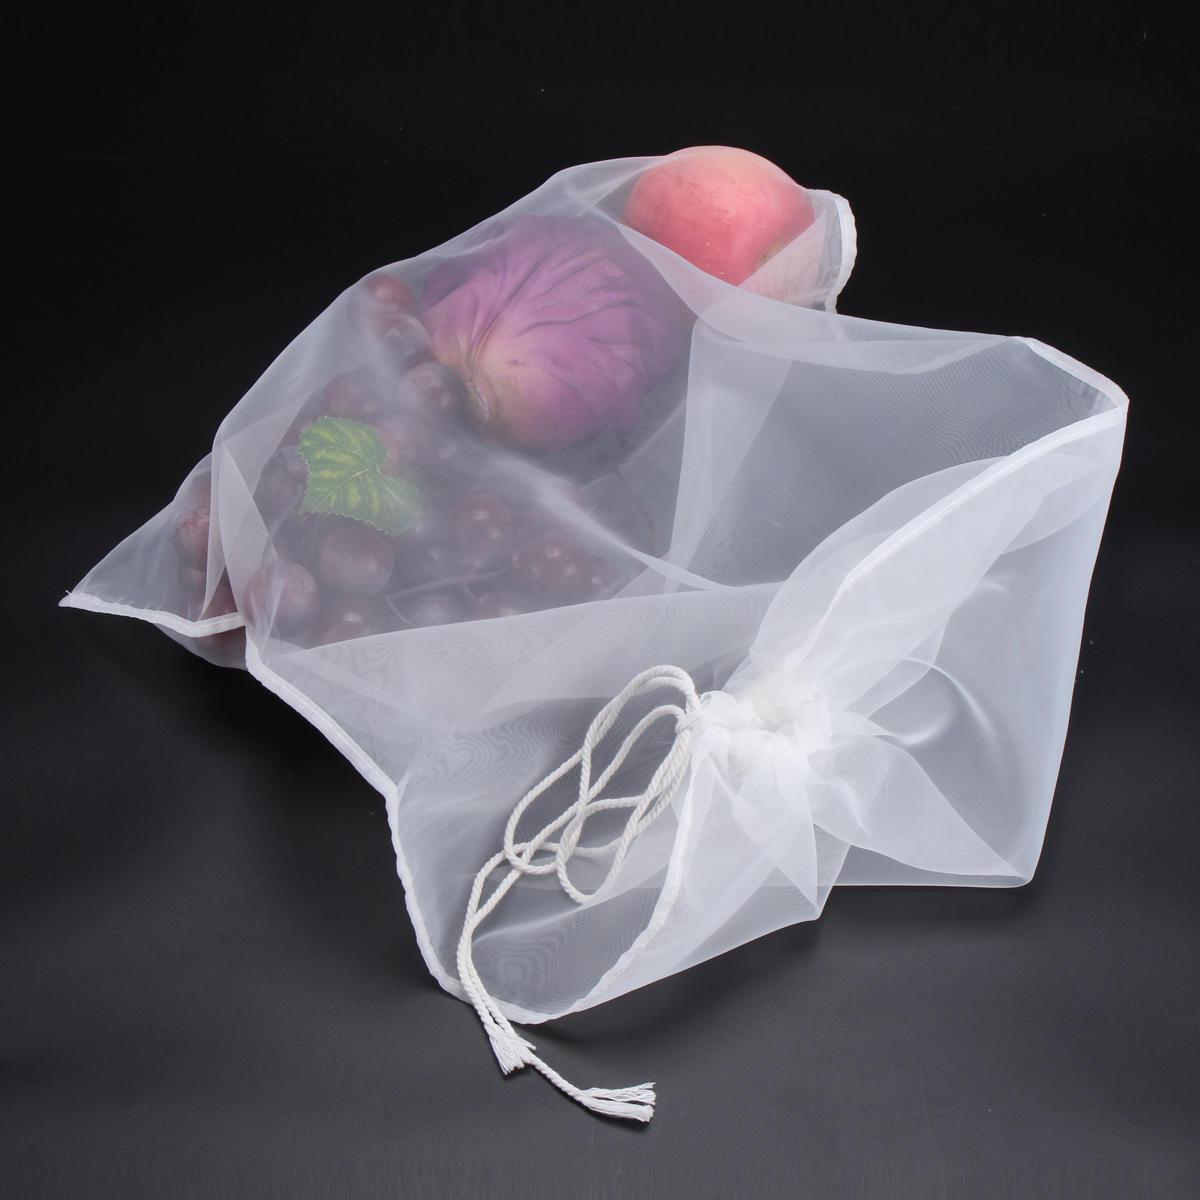 20*30/30*45/45*60cm 200 Mesh Reusable Straining Brewing Beer Net Bag Coffee Juice Filter Bag